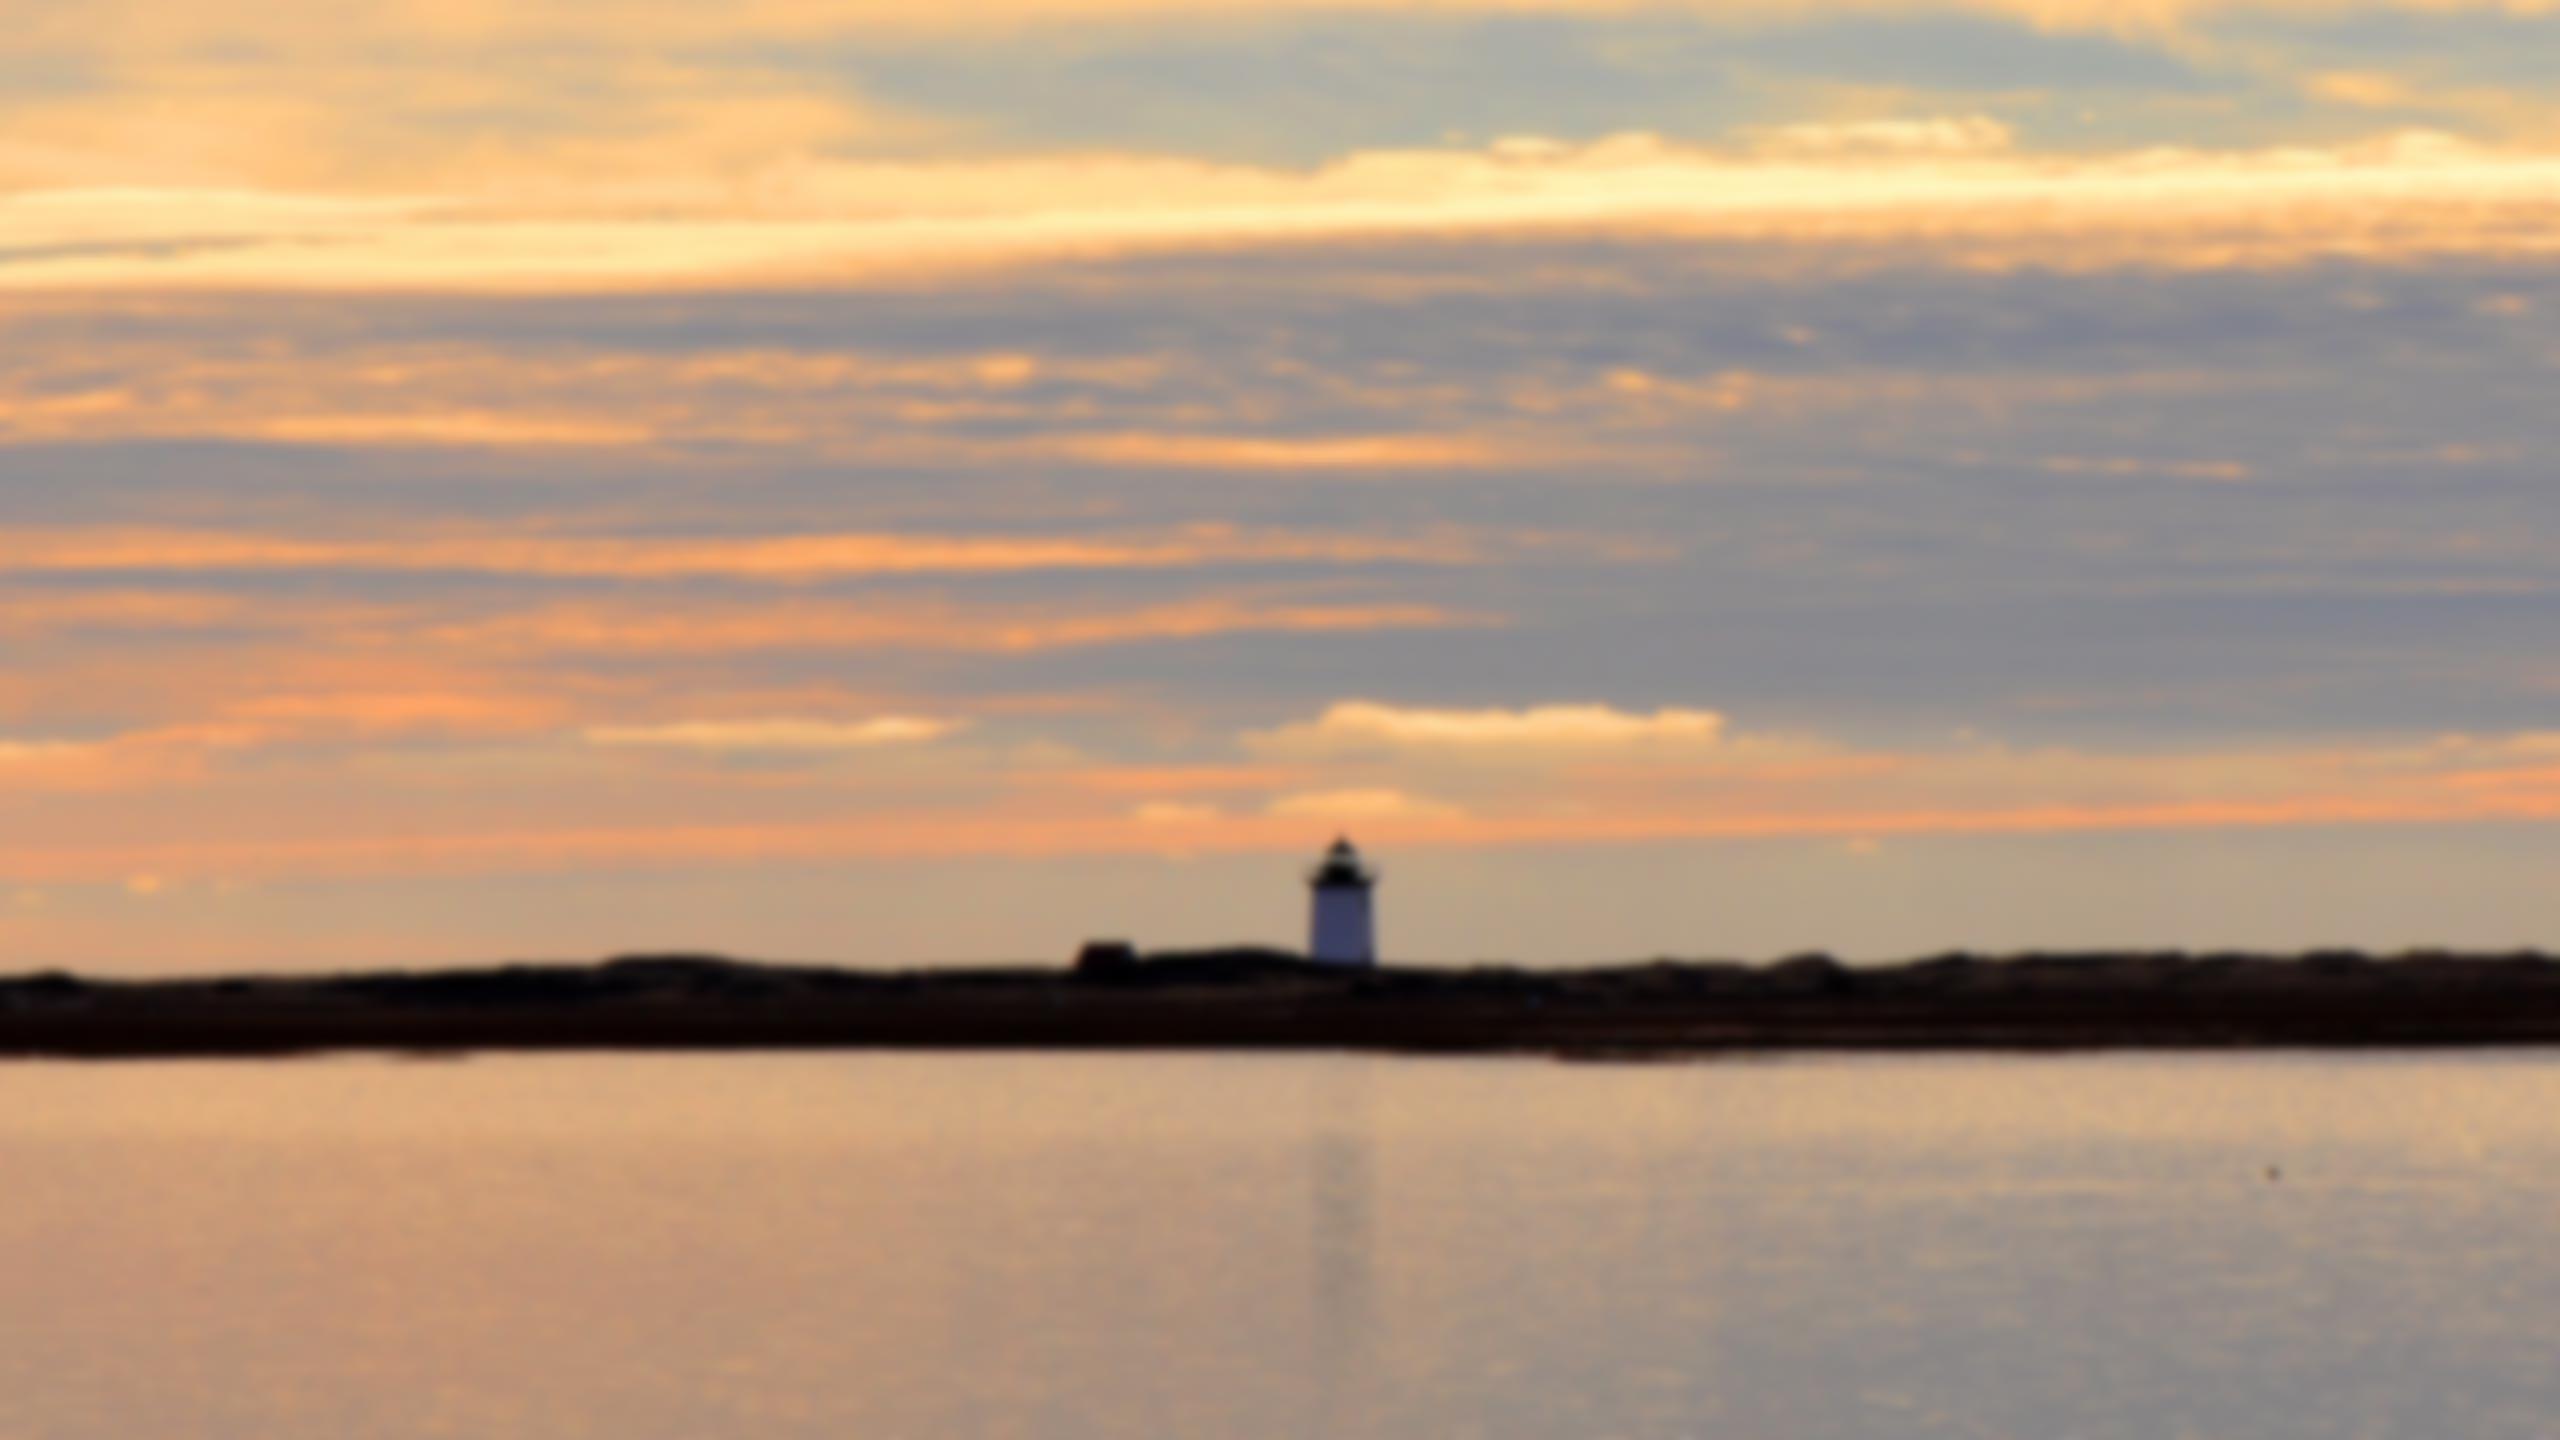 A lighthouse against a Cape Cod sunset